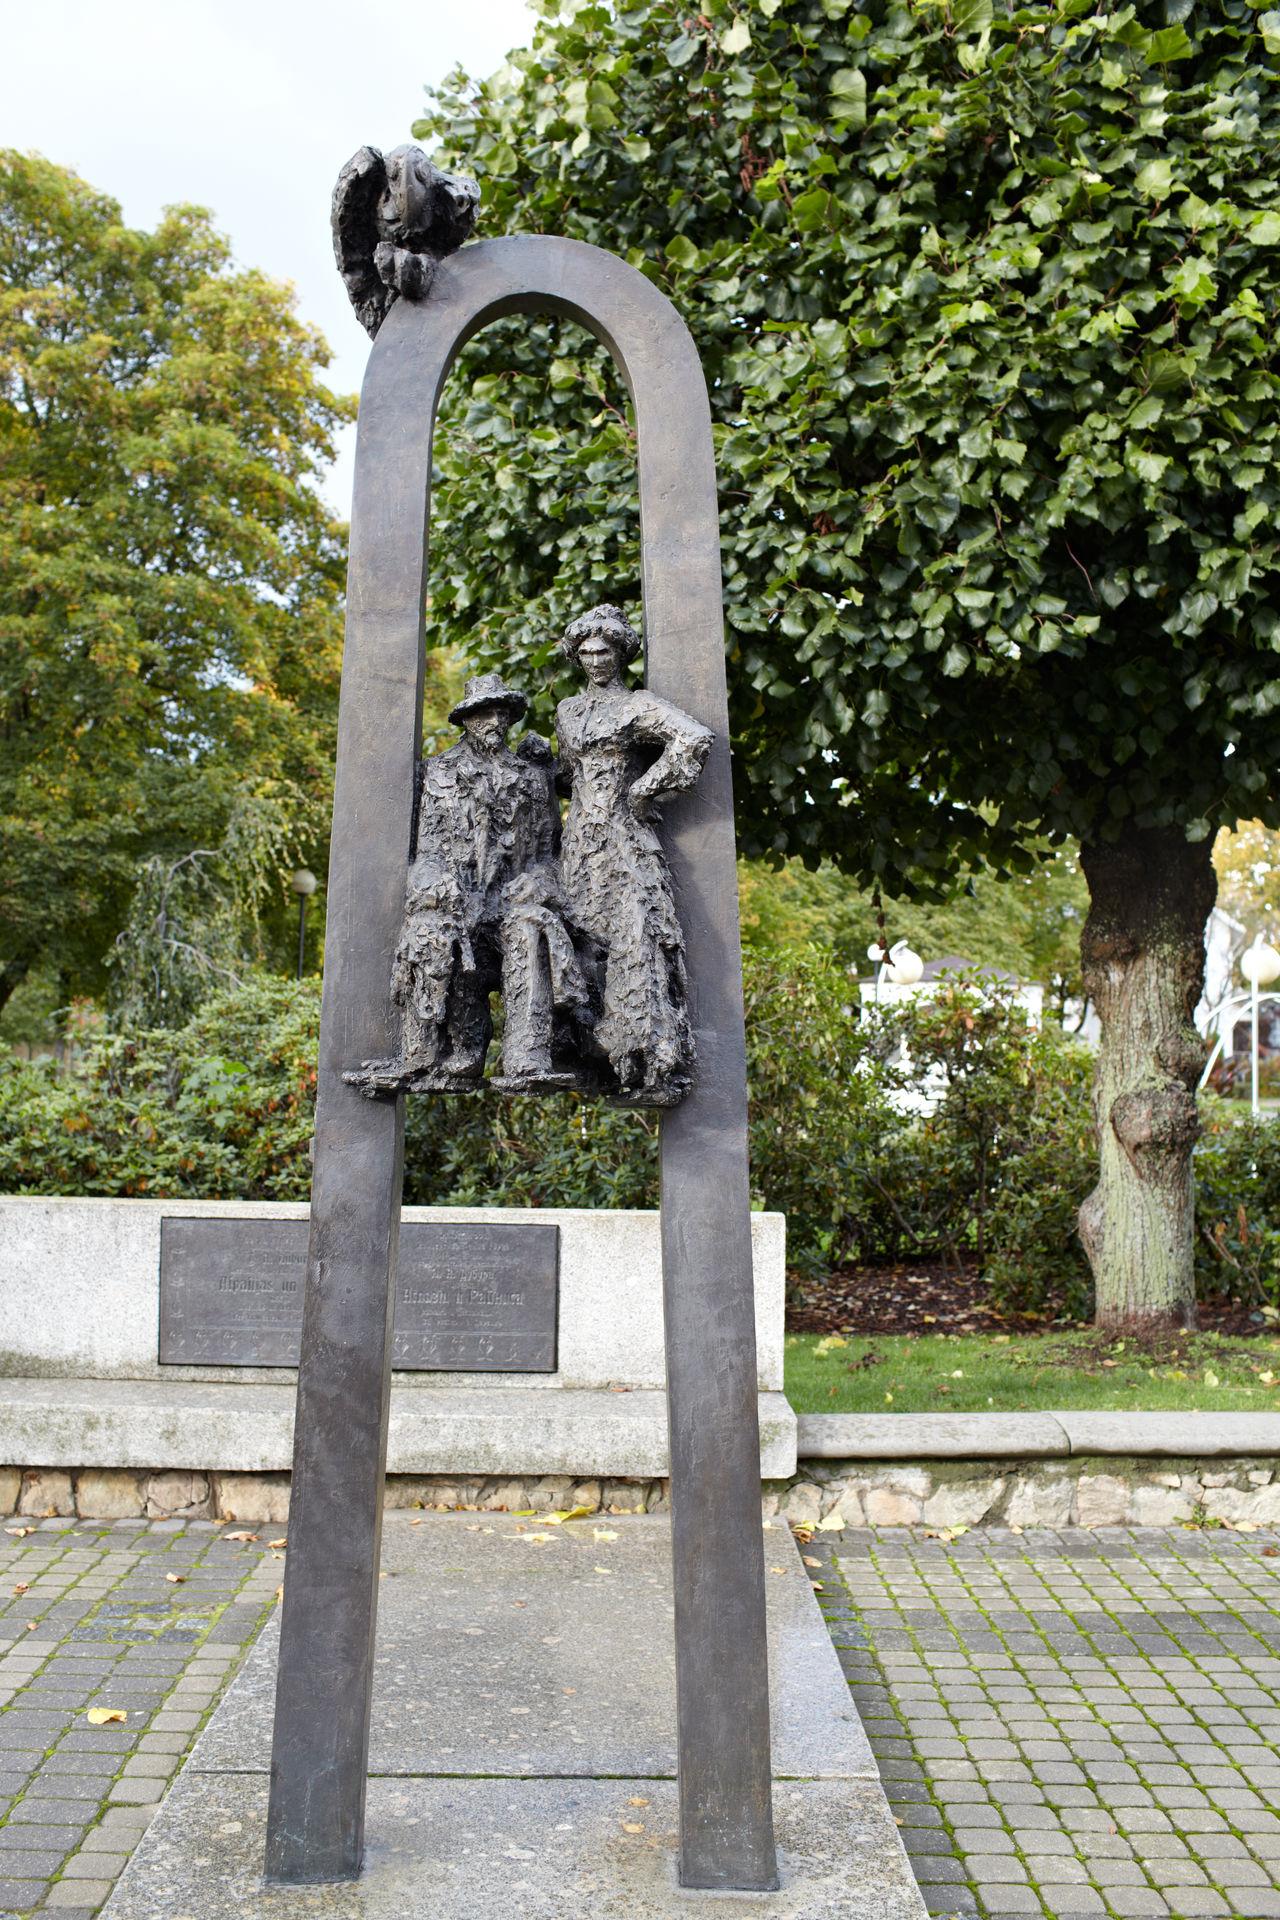 Art Aspazija Baltic Figure Janis Plieksans Jurmala Latvia Poet Rainis Sculpture Stone Writers